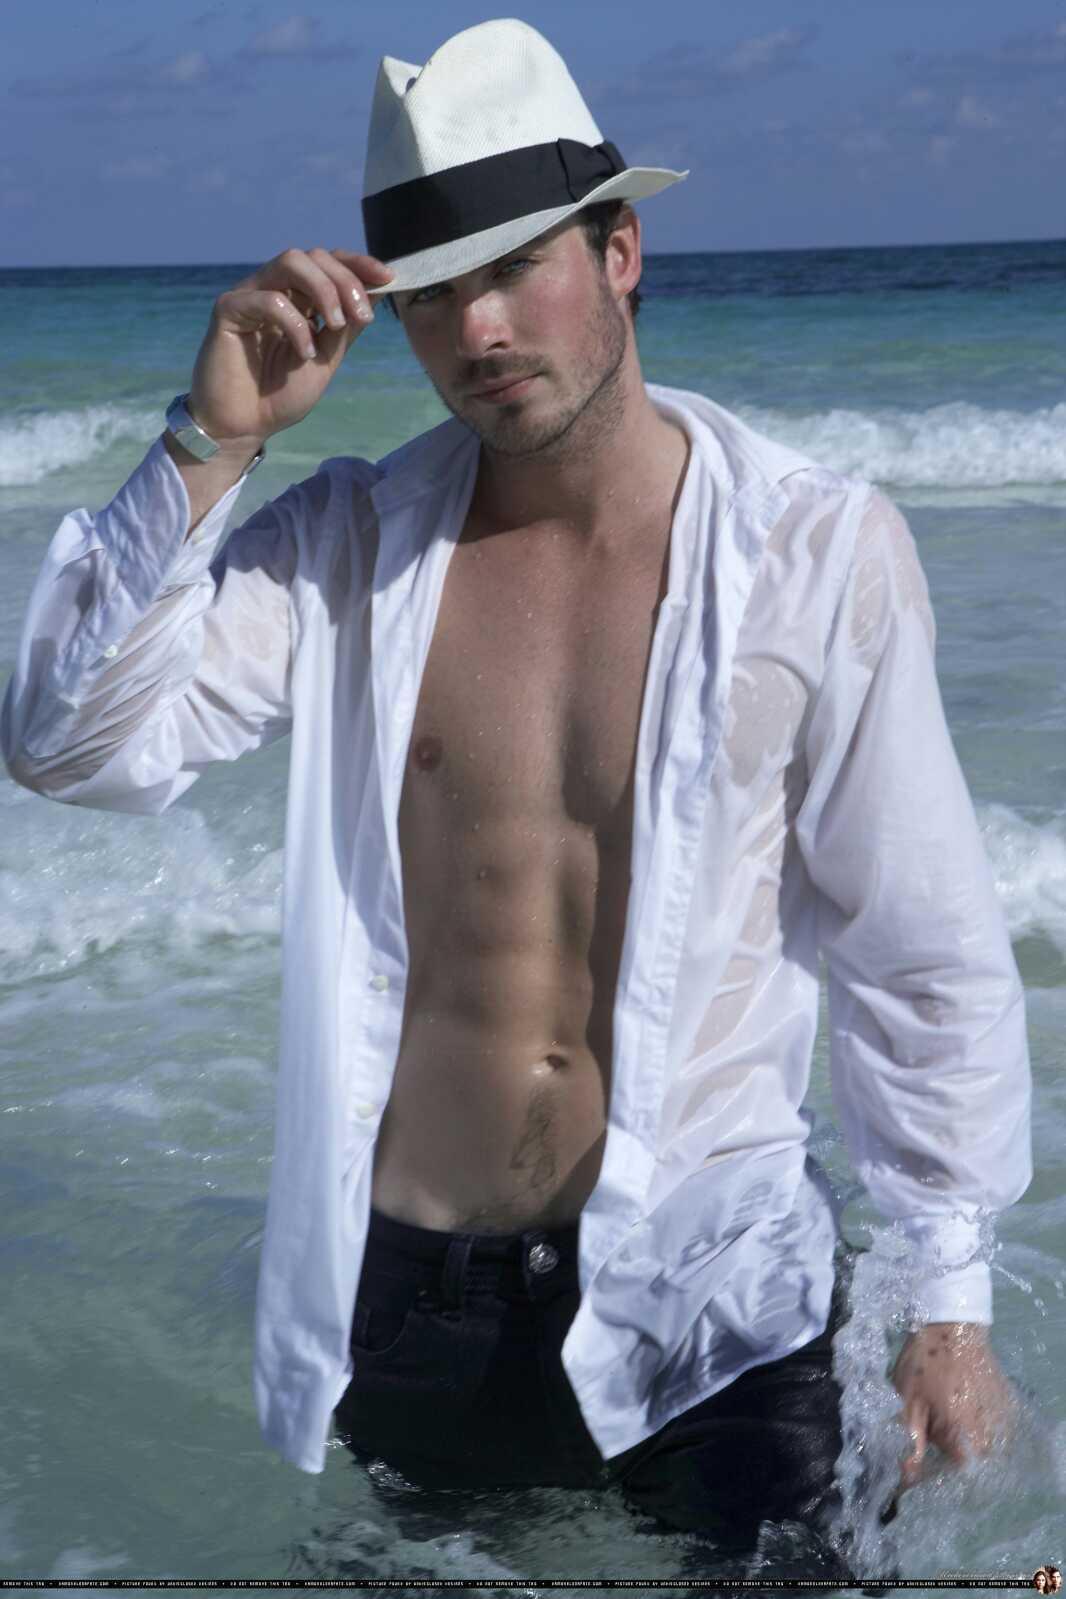 Yolanthe Cabau van Kasbergen topless   The Hottes